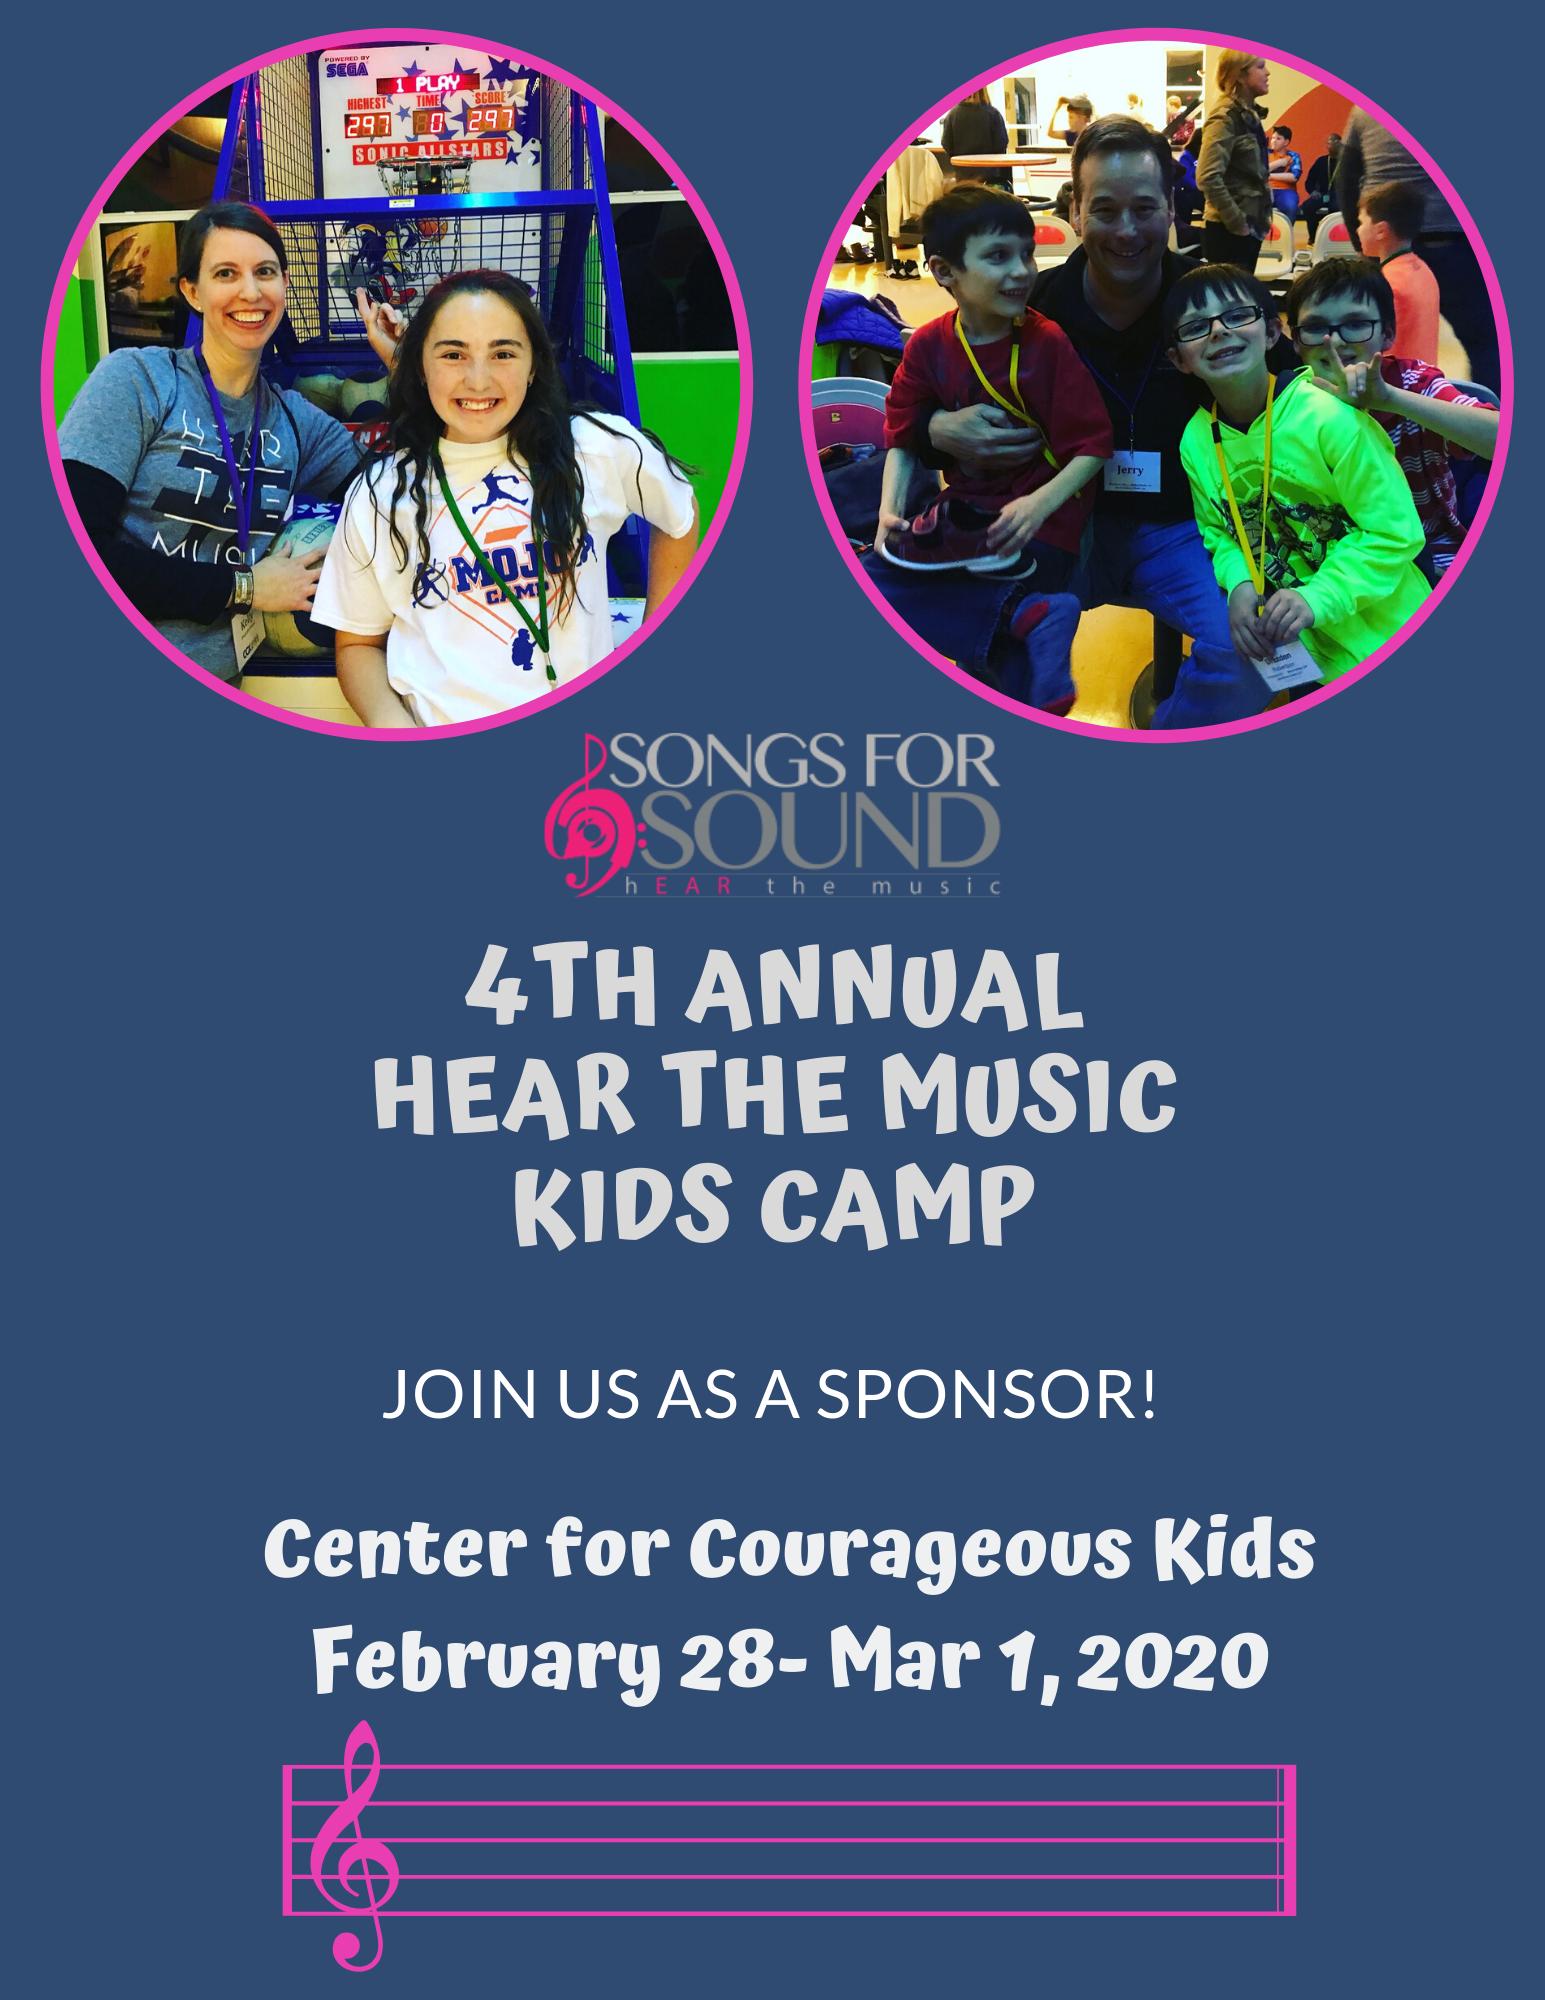 Hear the Music Kids Camp Sponsor Brochure